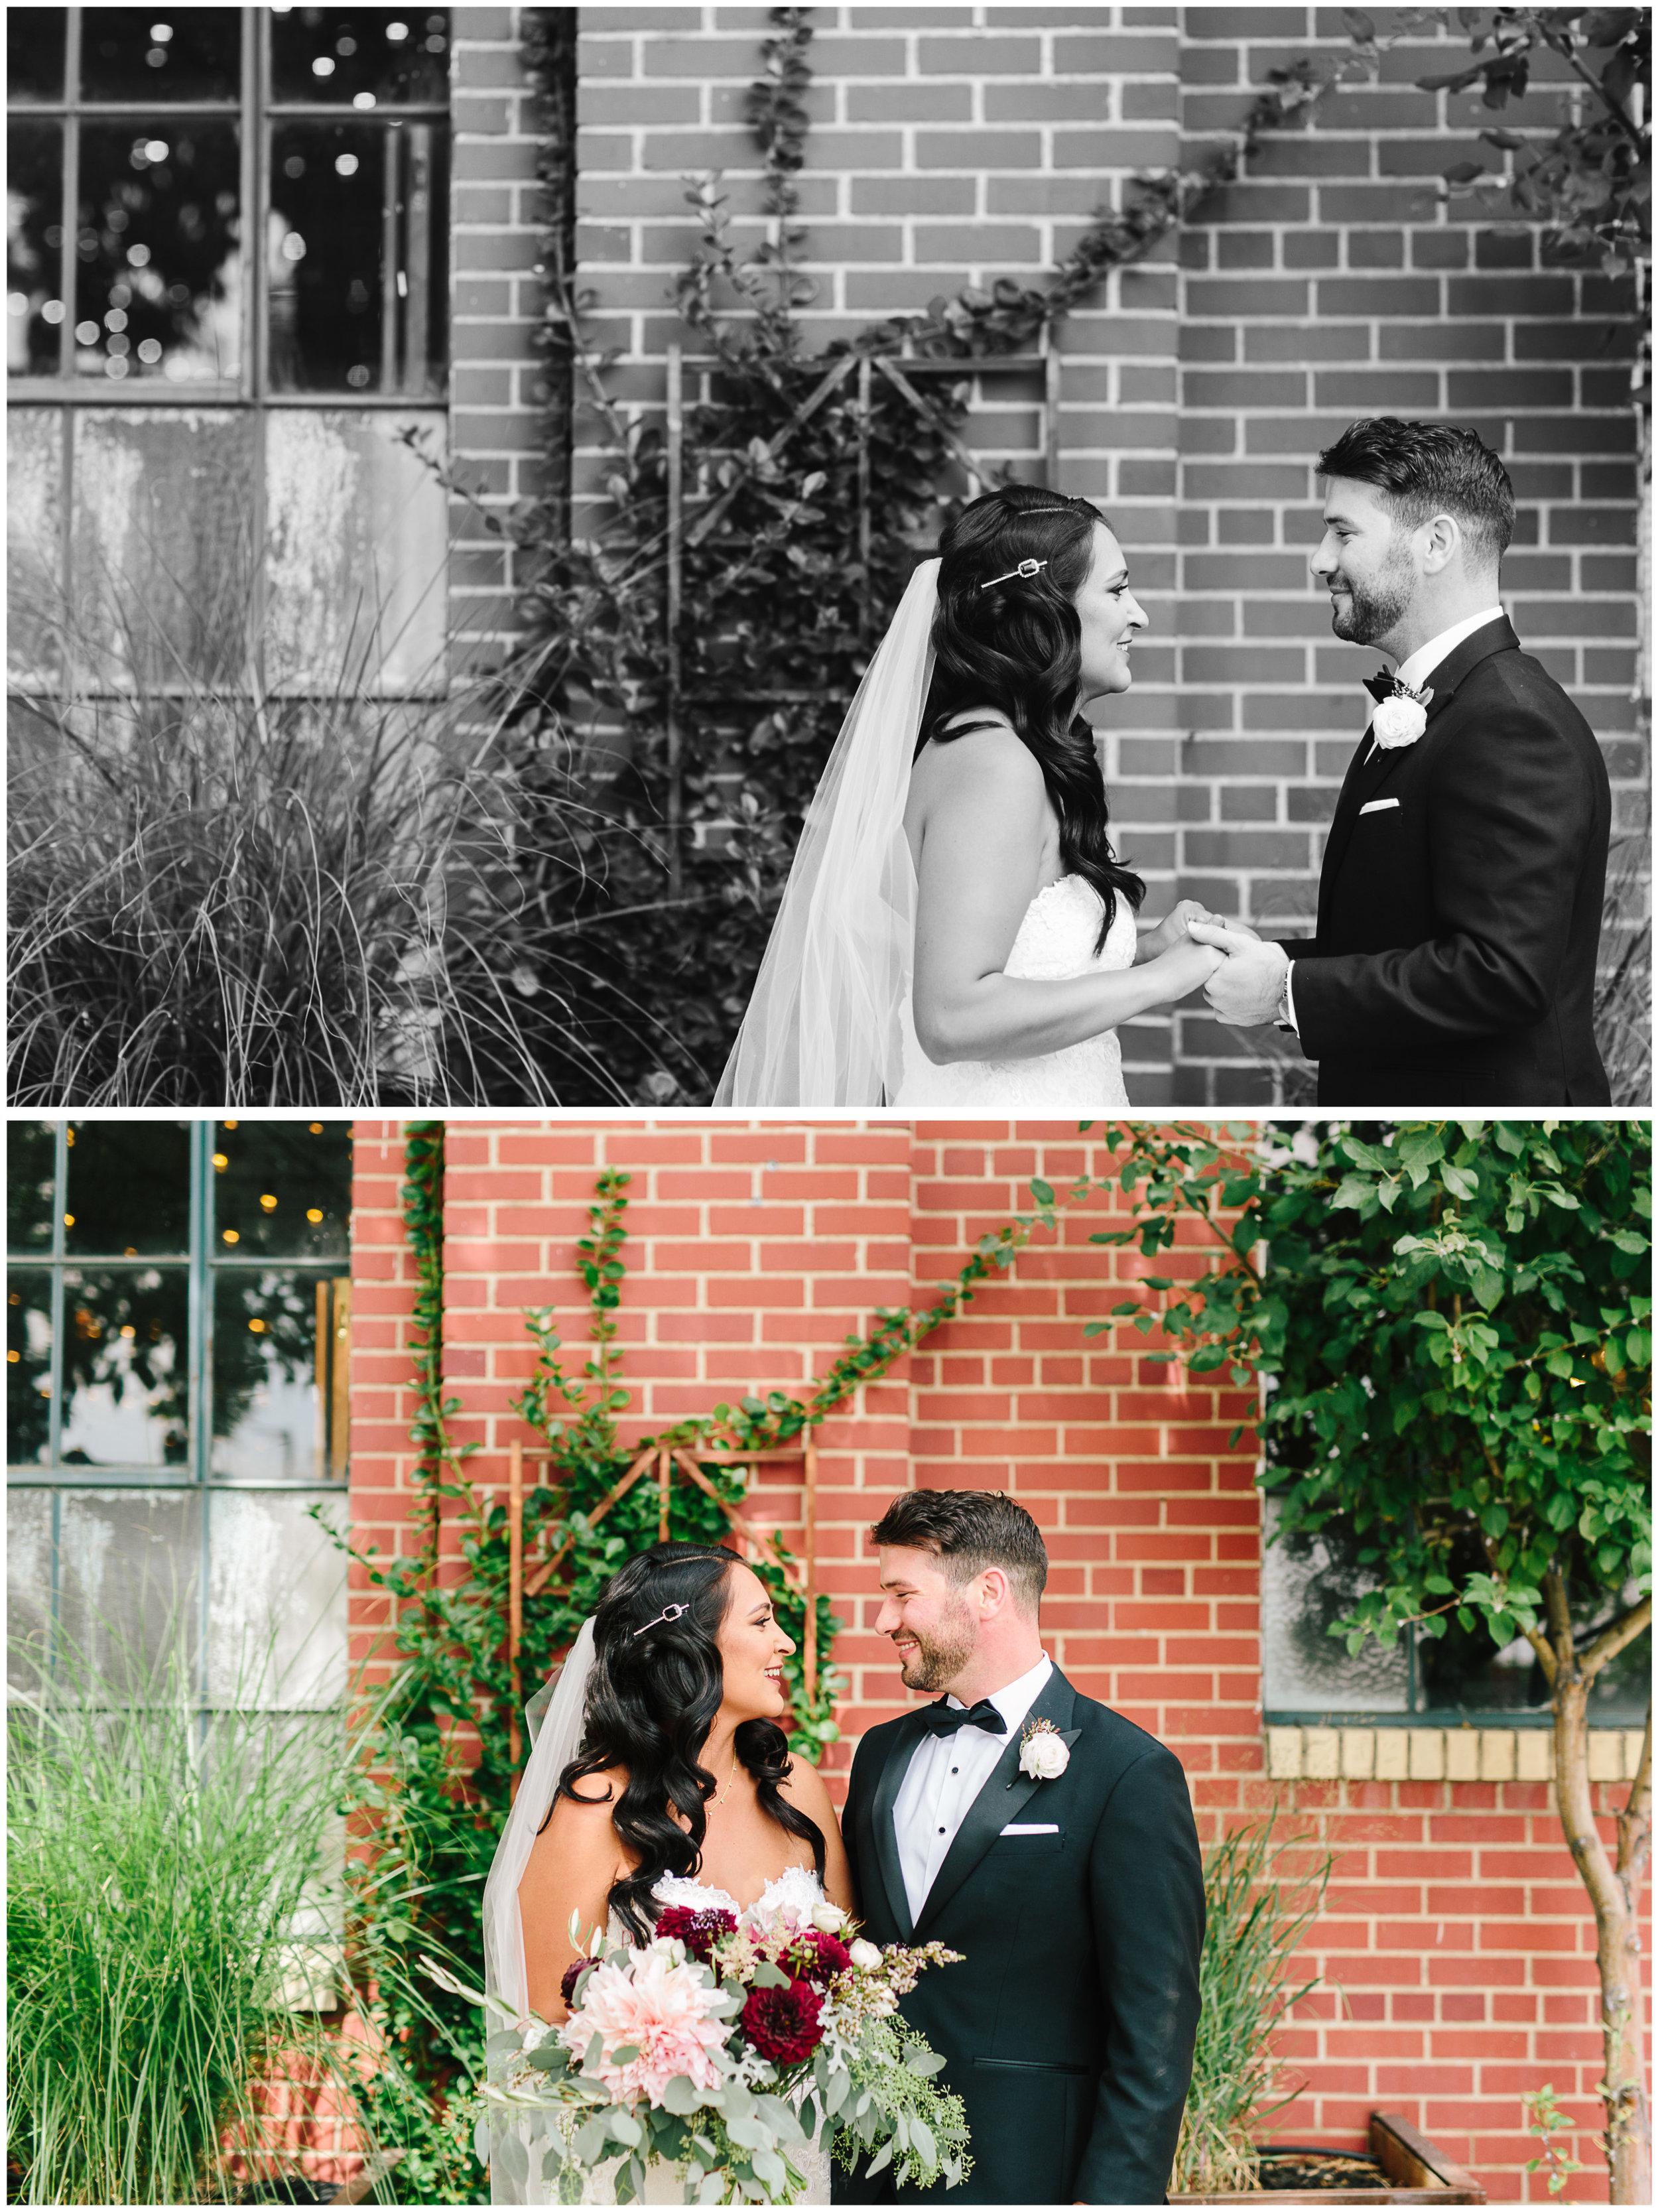 moss_denver_wedding_20.jpg